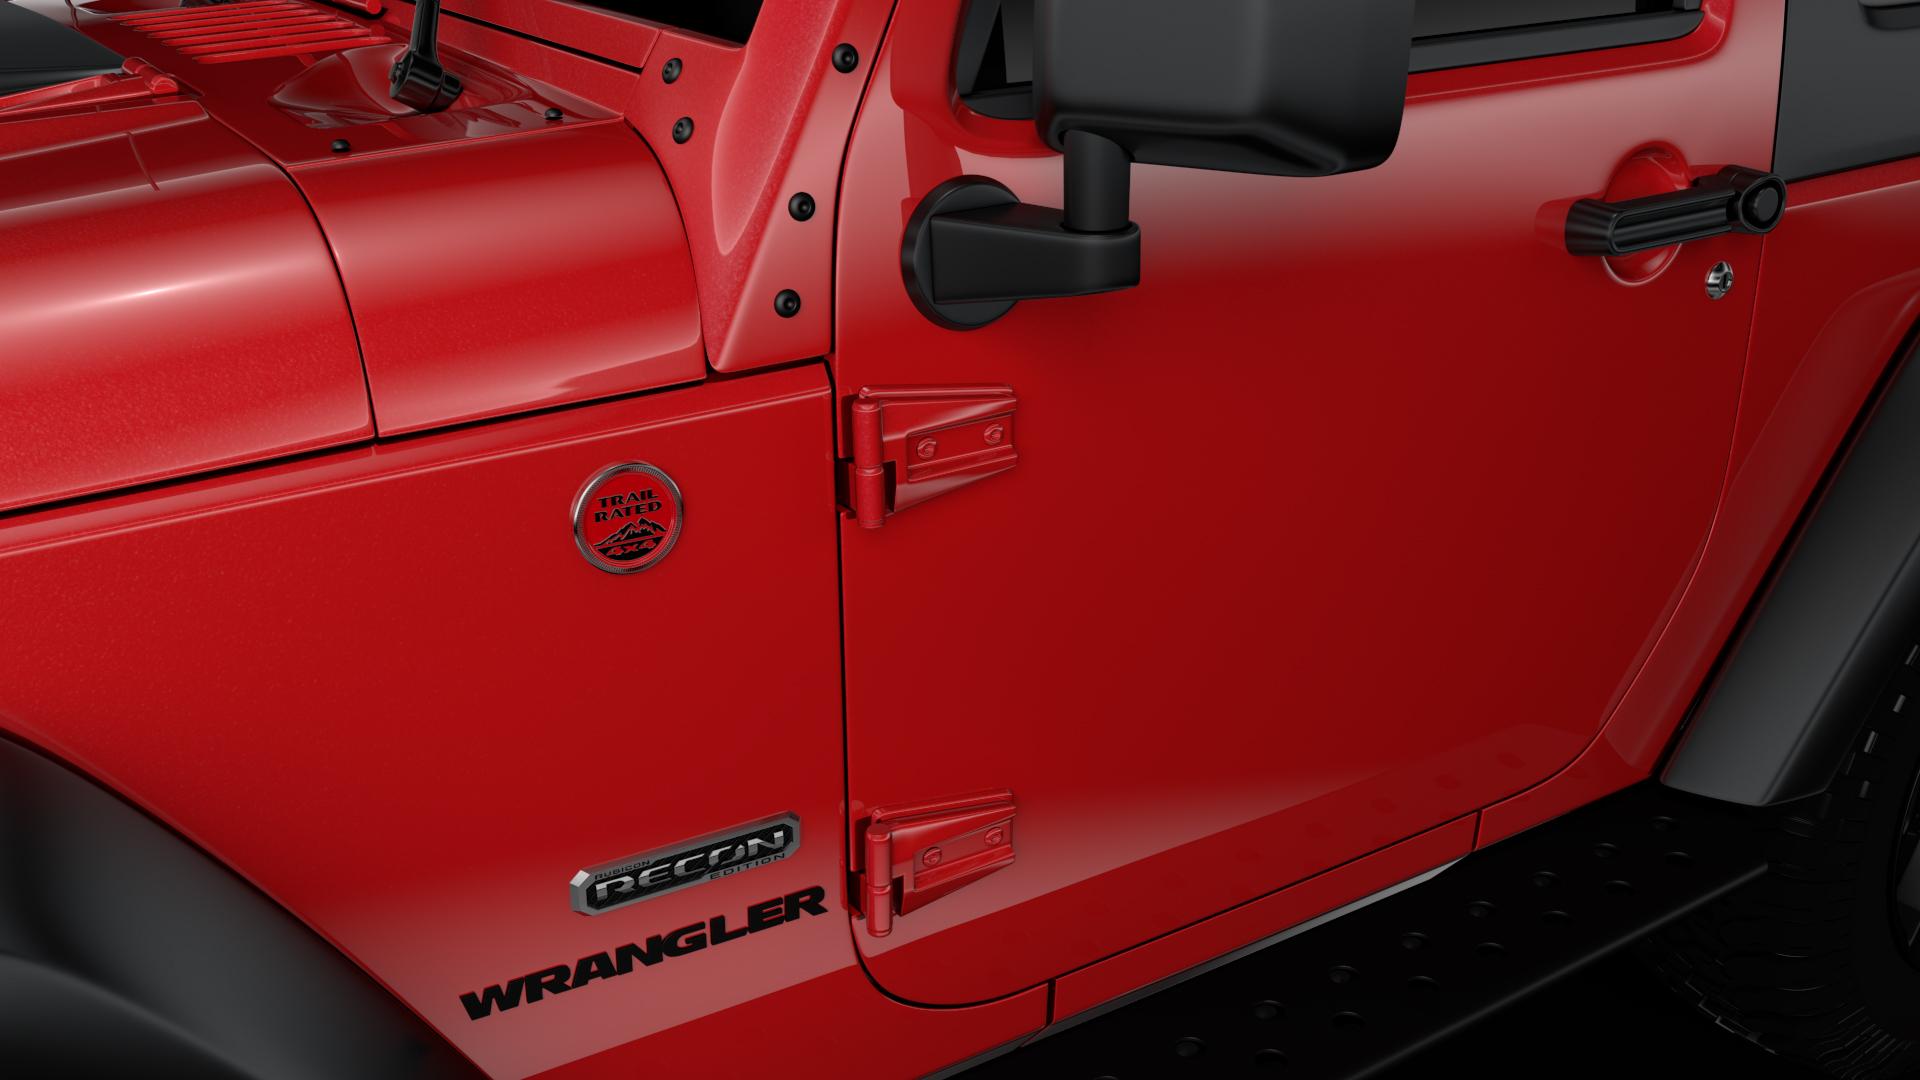 jeep wrangler 6×6 rubicon recon jk 2017 3d model max fbx c4d lwo ma mb hrc xsi obj 276850